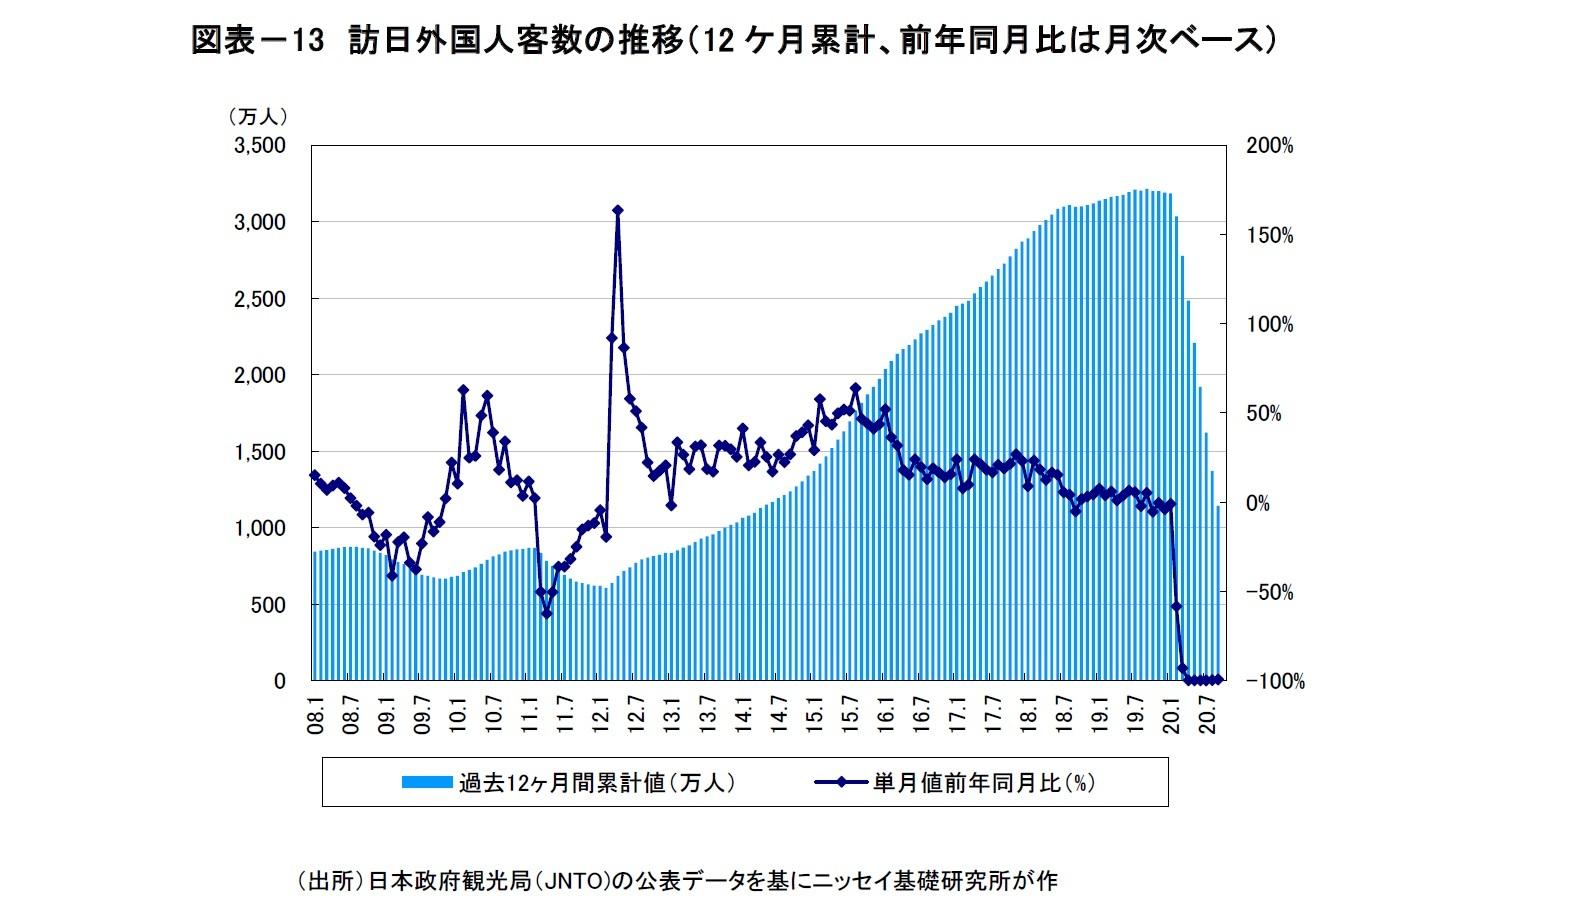 図表-13 訪日外国人客数の推移(12ケ月累計、前年同月比は月次ベース)